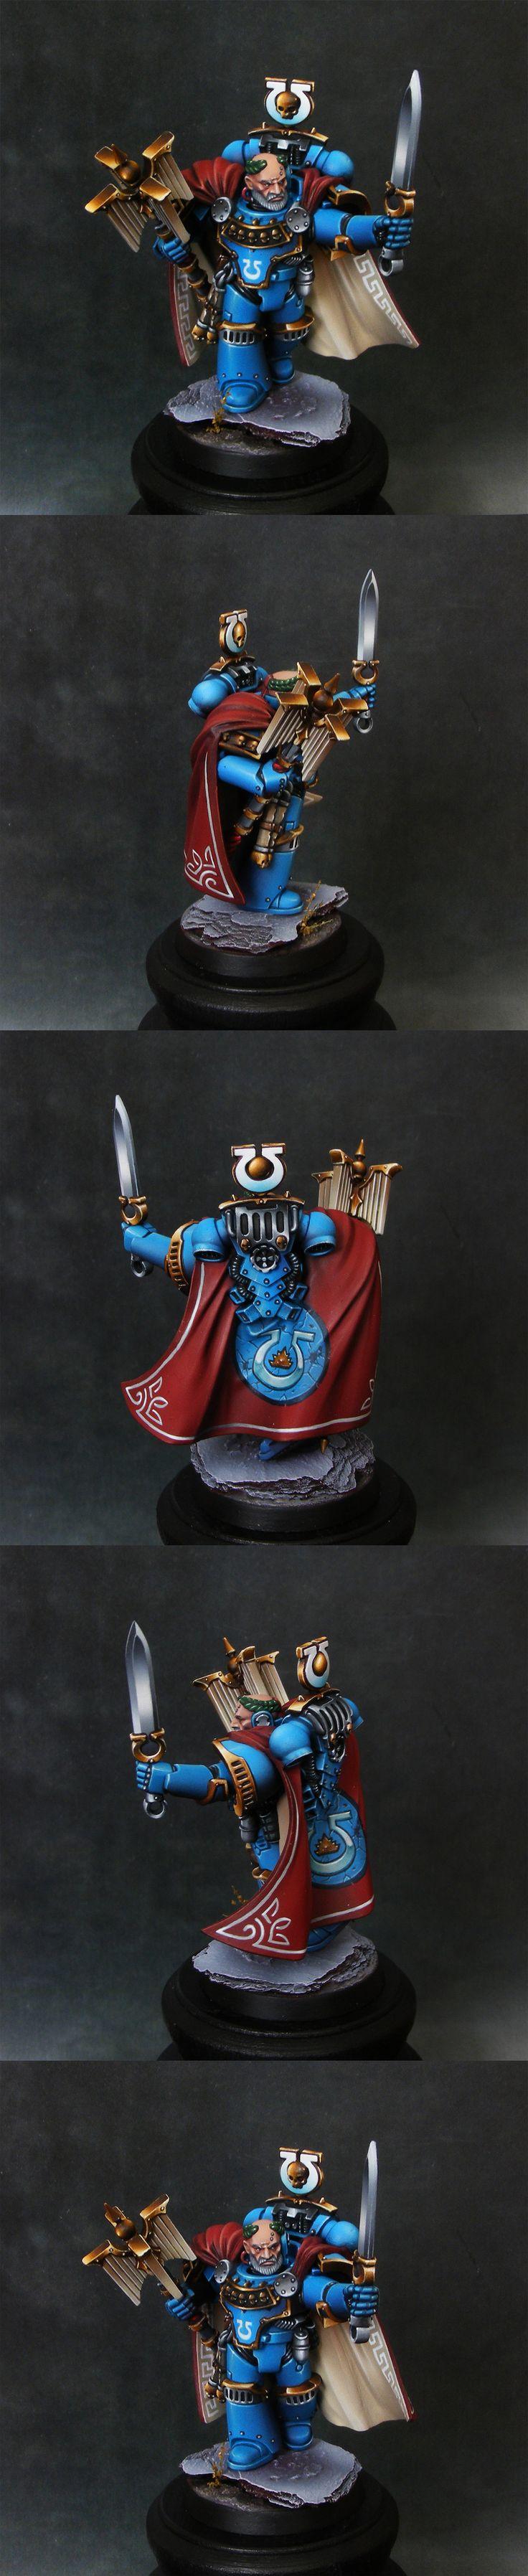 Ultramarine hero from Betrayal at Calth - dexterzg